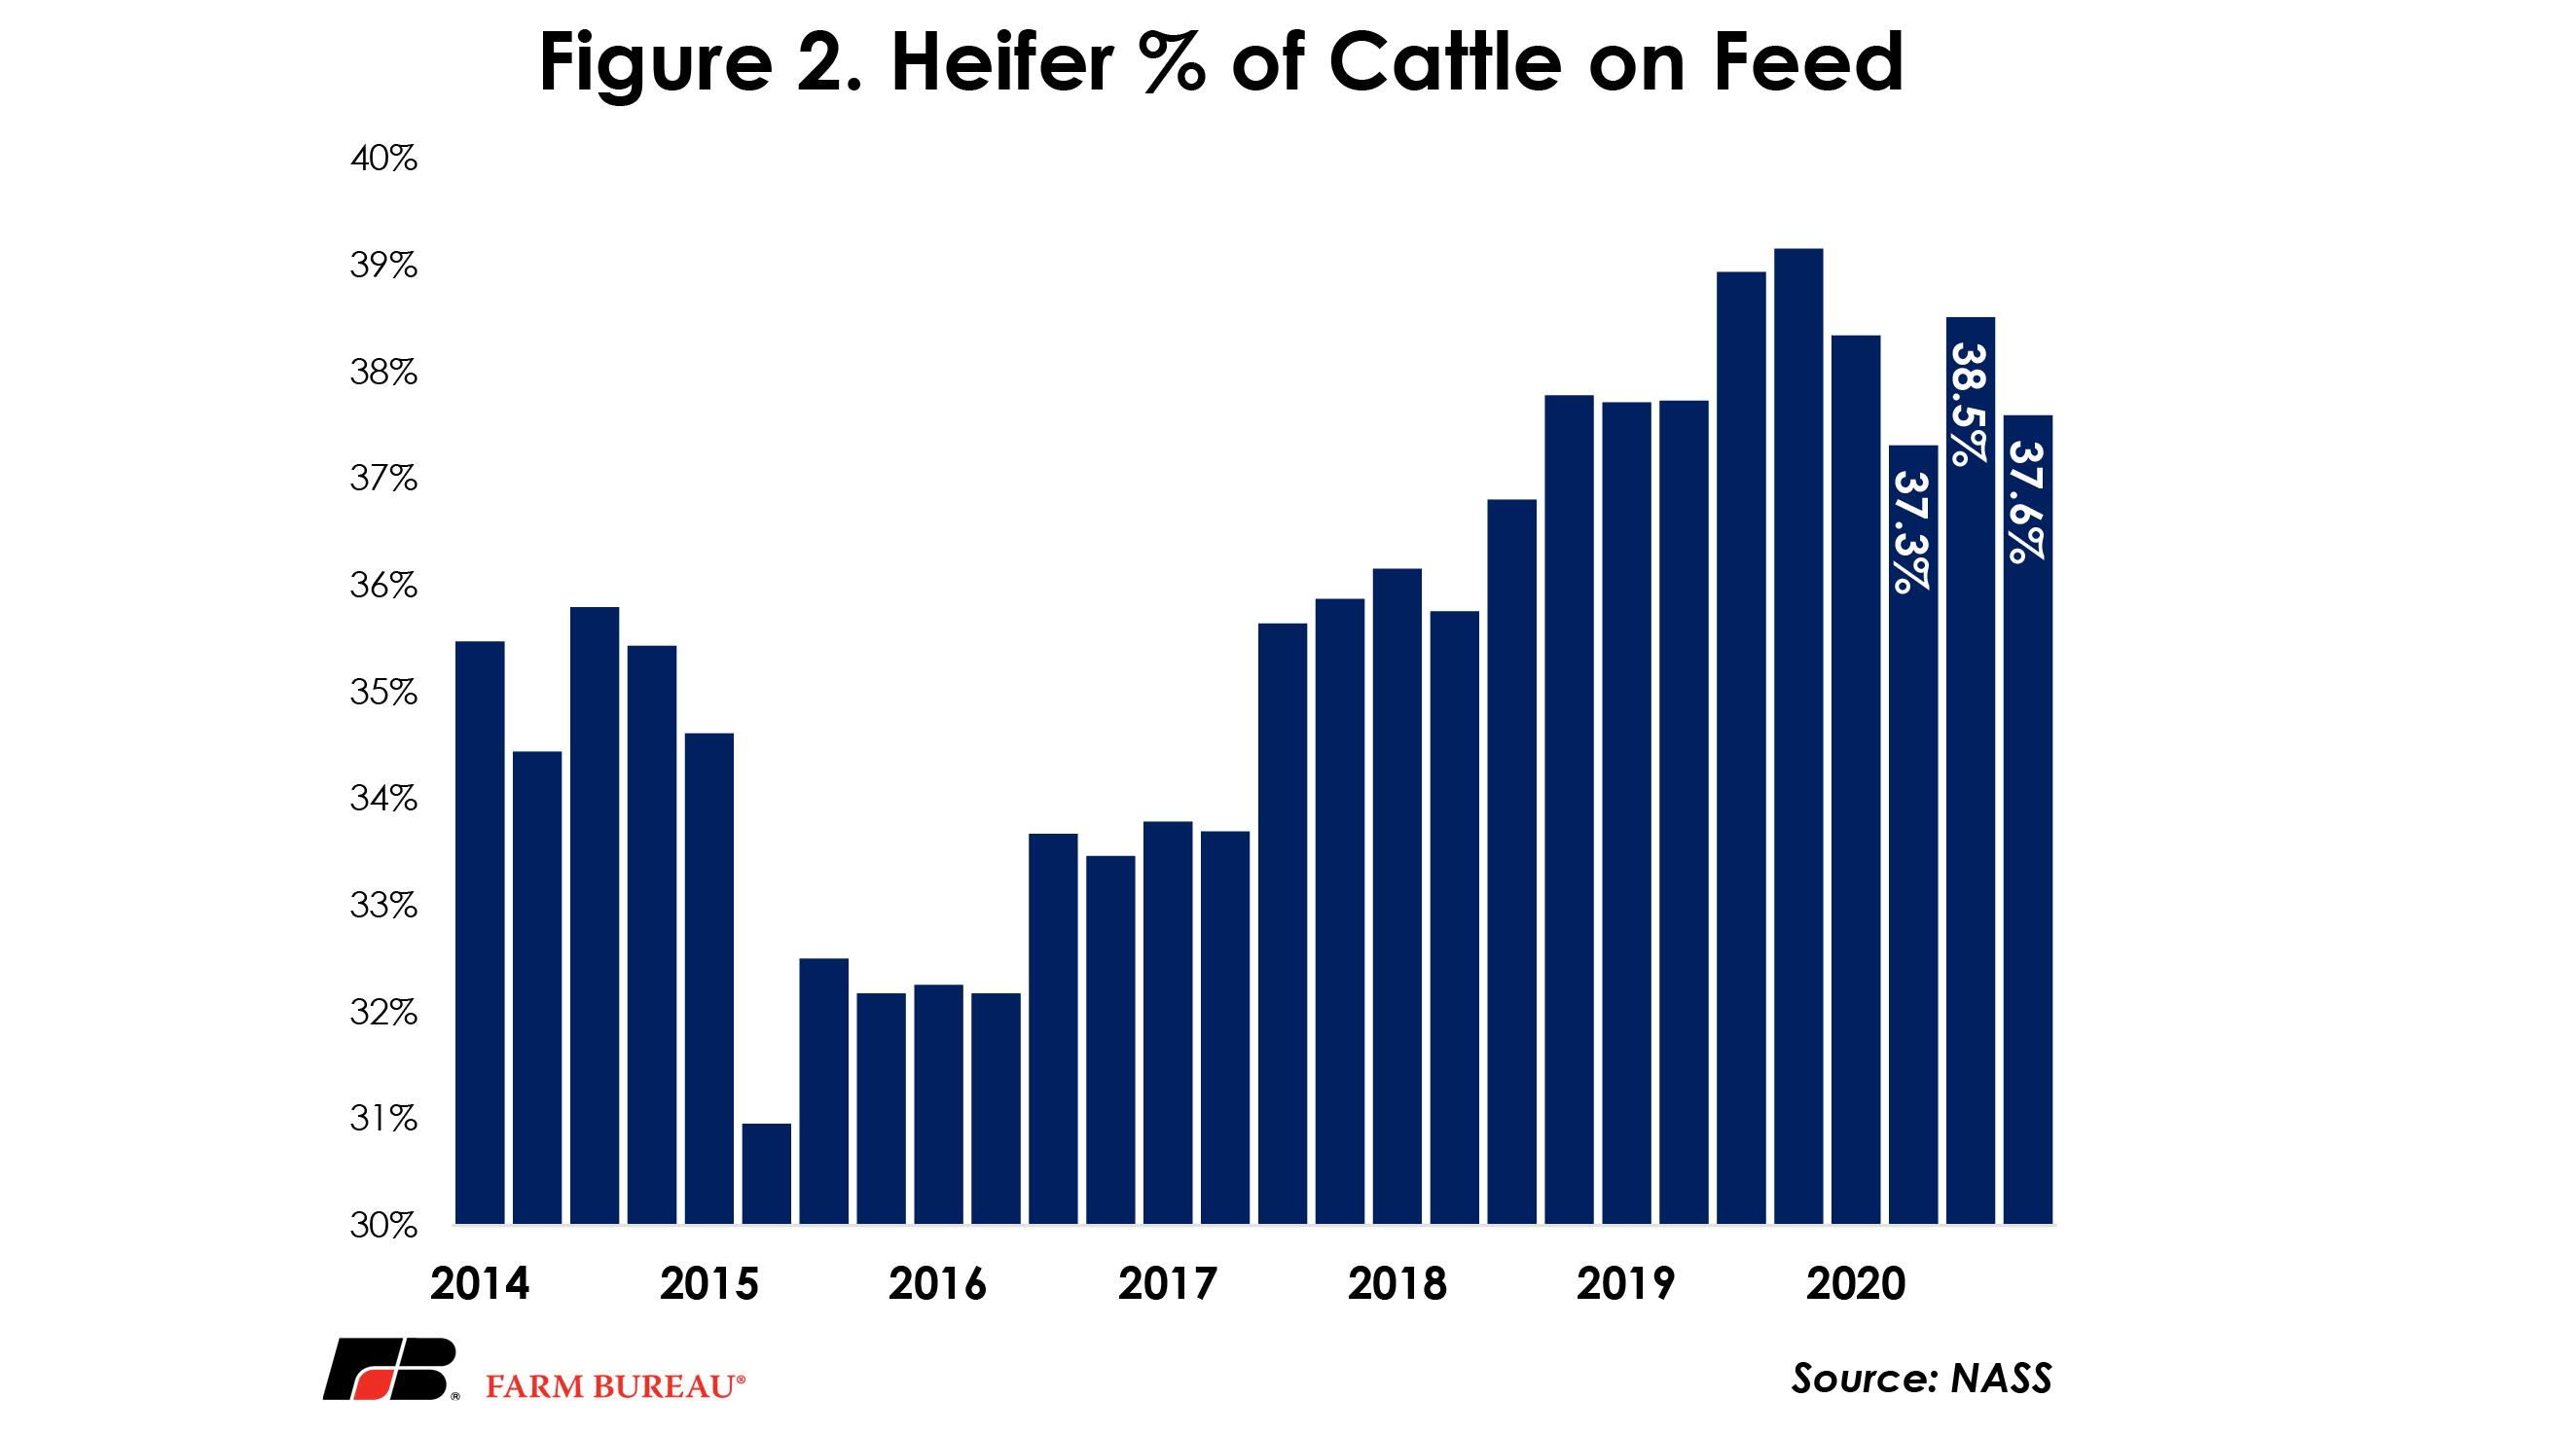 Figure 2 - Heifer % of Cattle of Feed